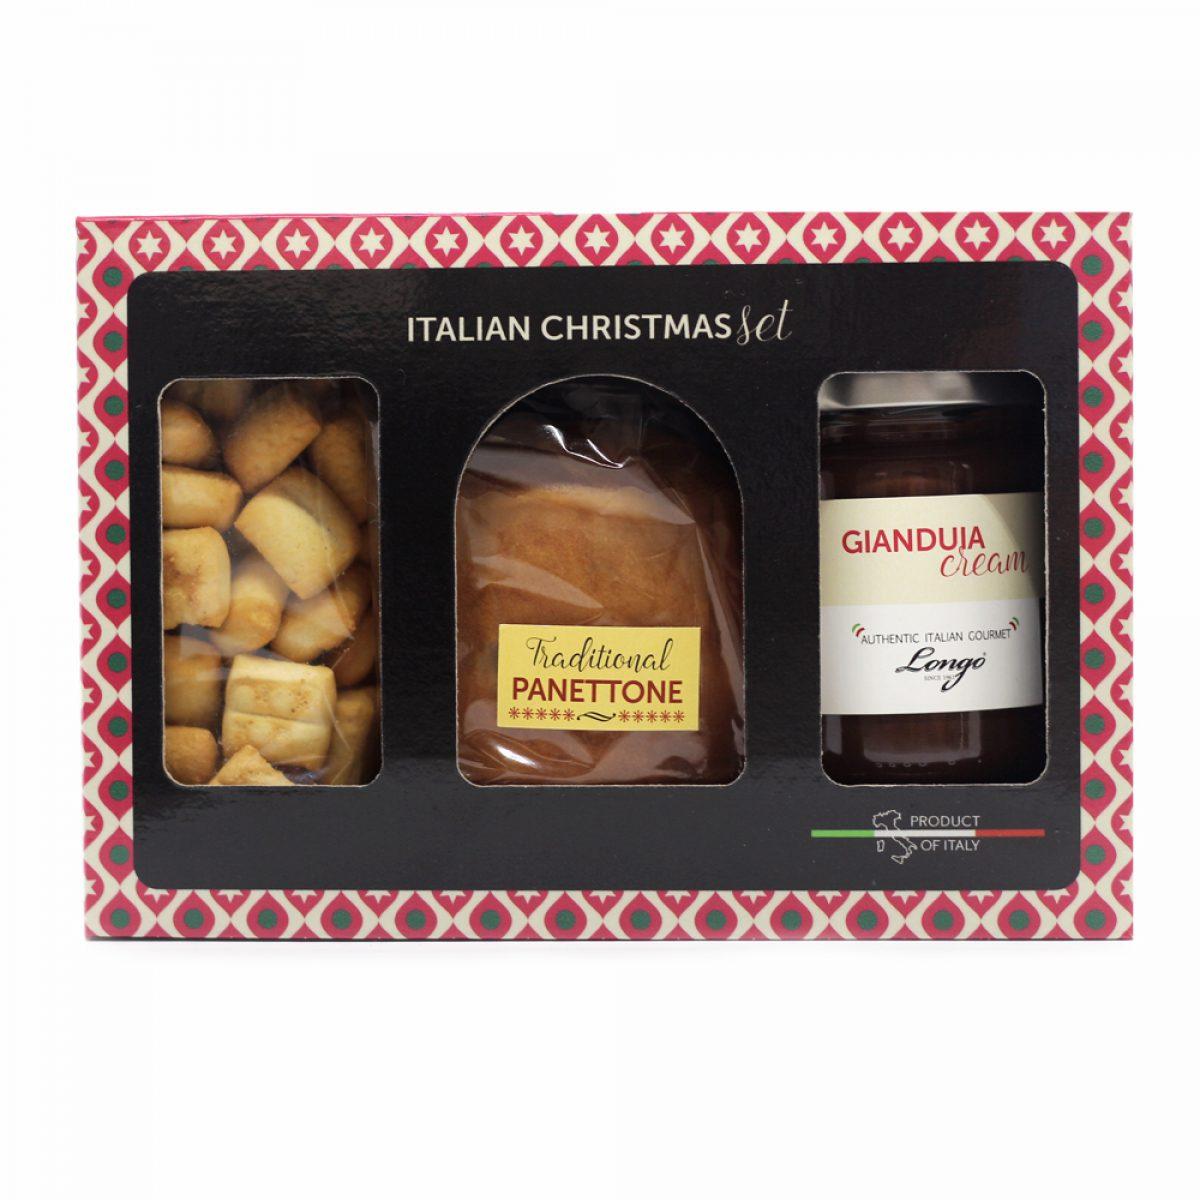 Italian Christmas set